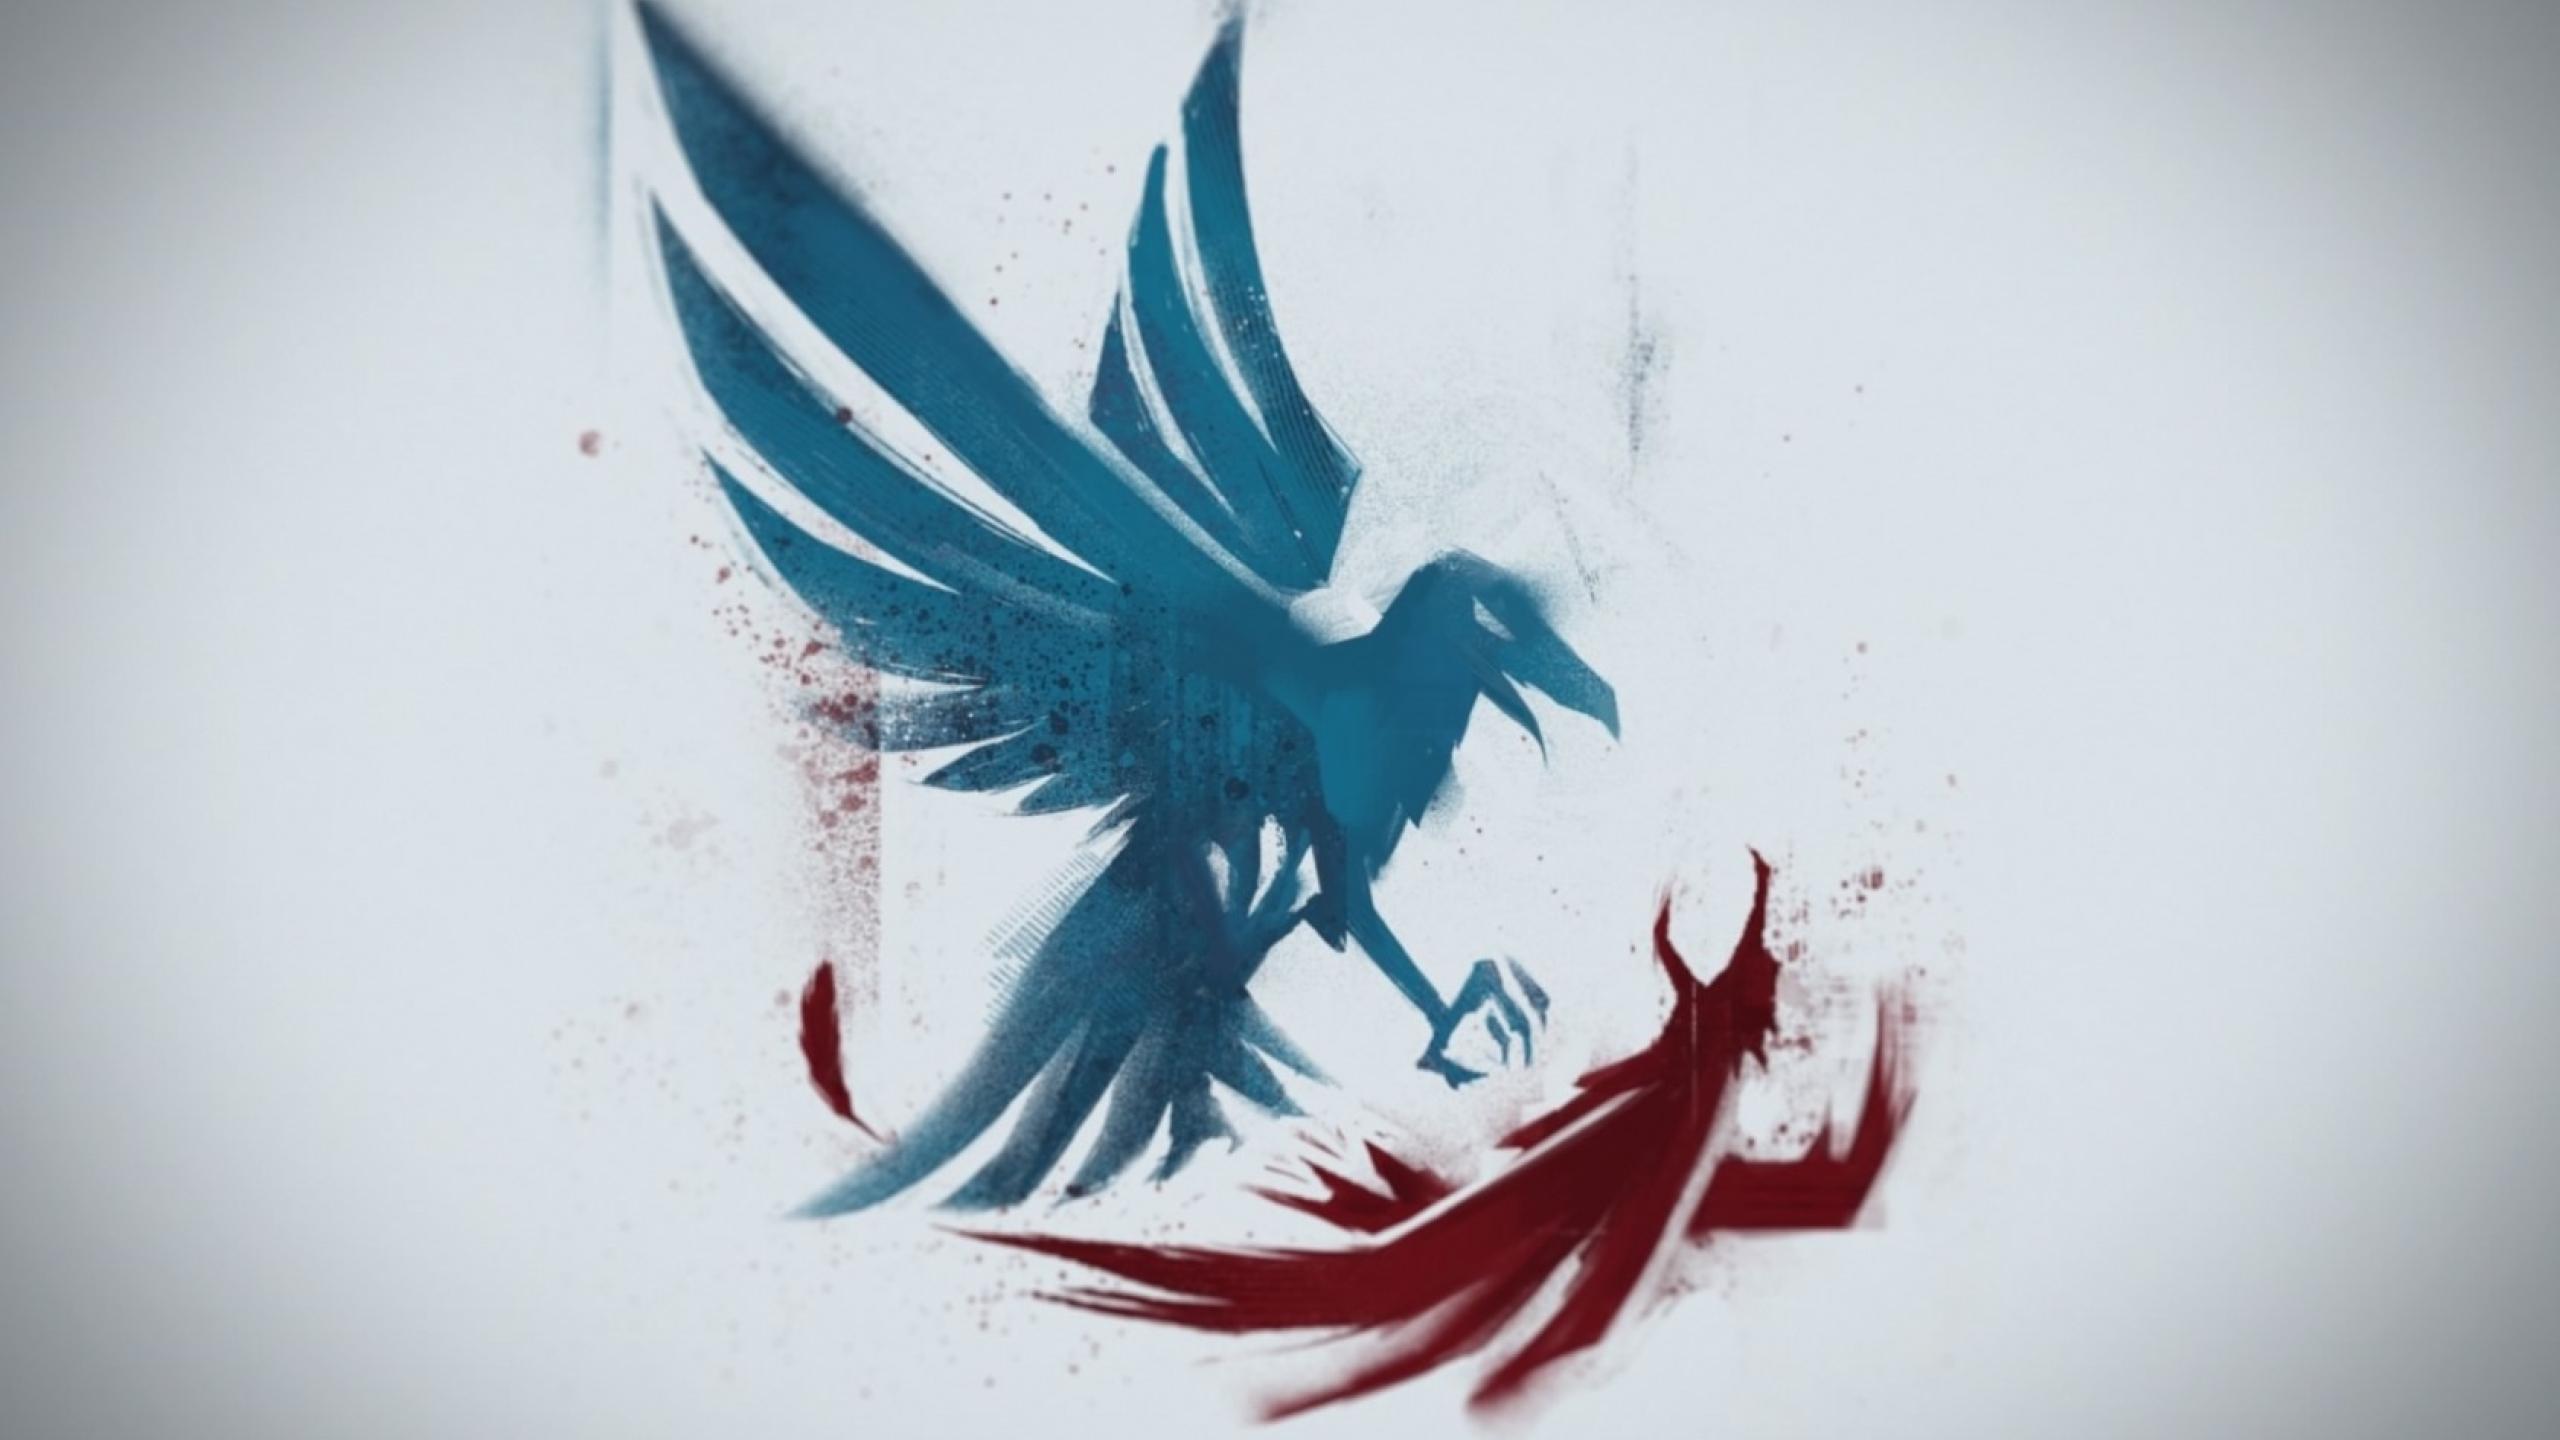 2560x1440 Infamous Second Son Bird 1440p Resolution Wallpaper